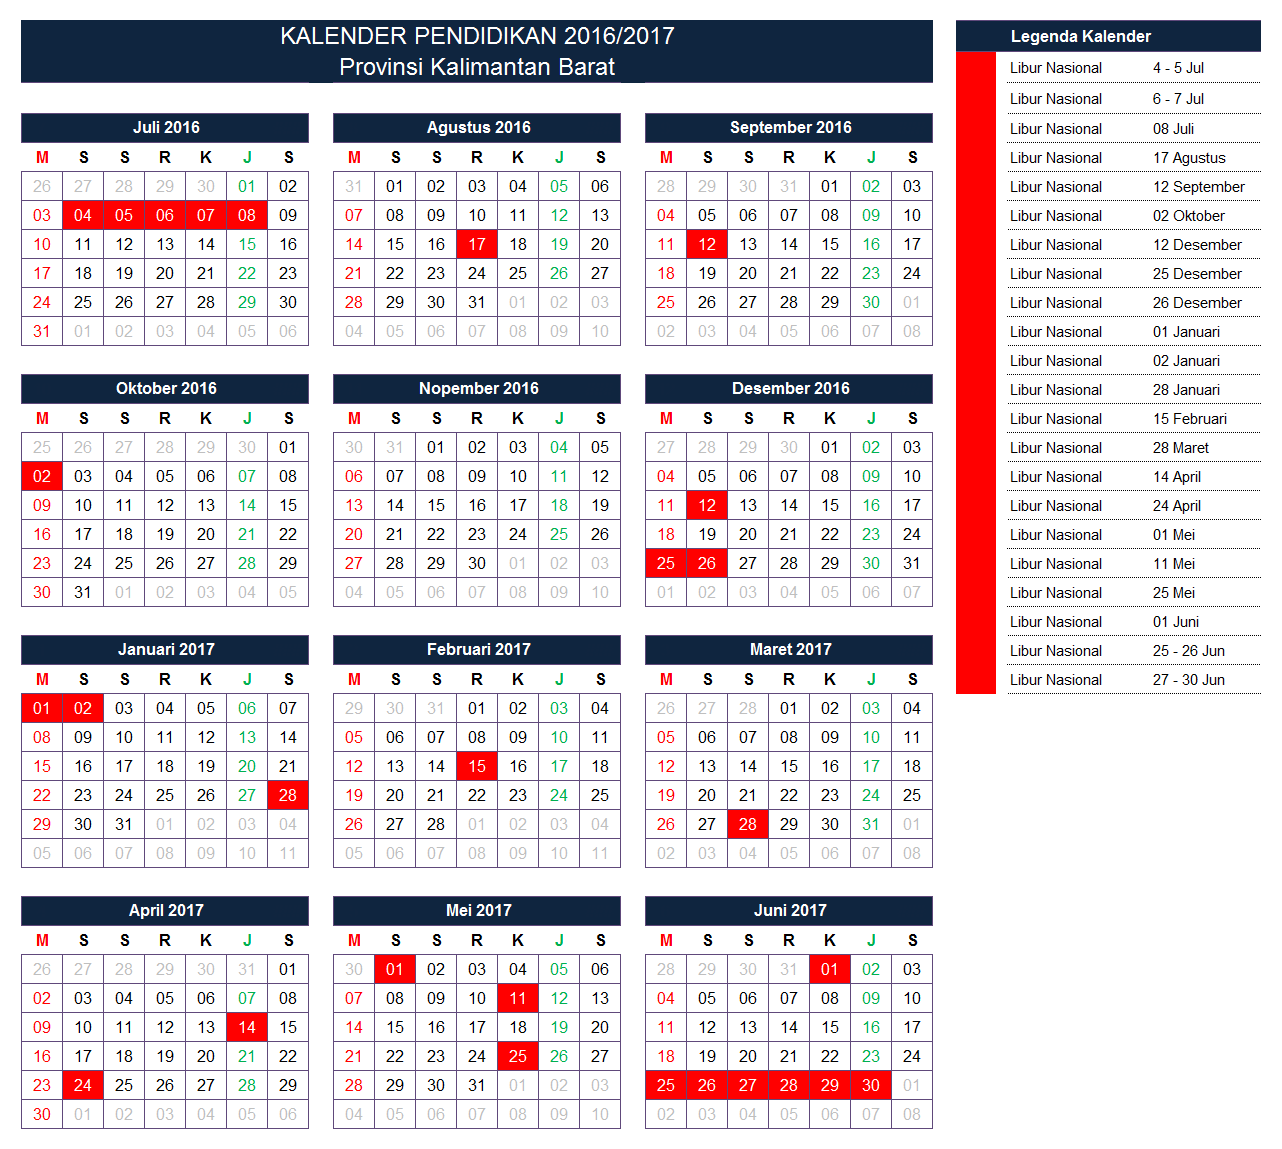 Kalender Pendidikan Provinsi Kalimantan Barat